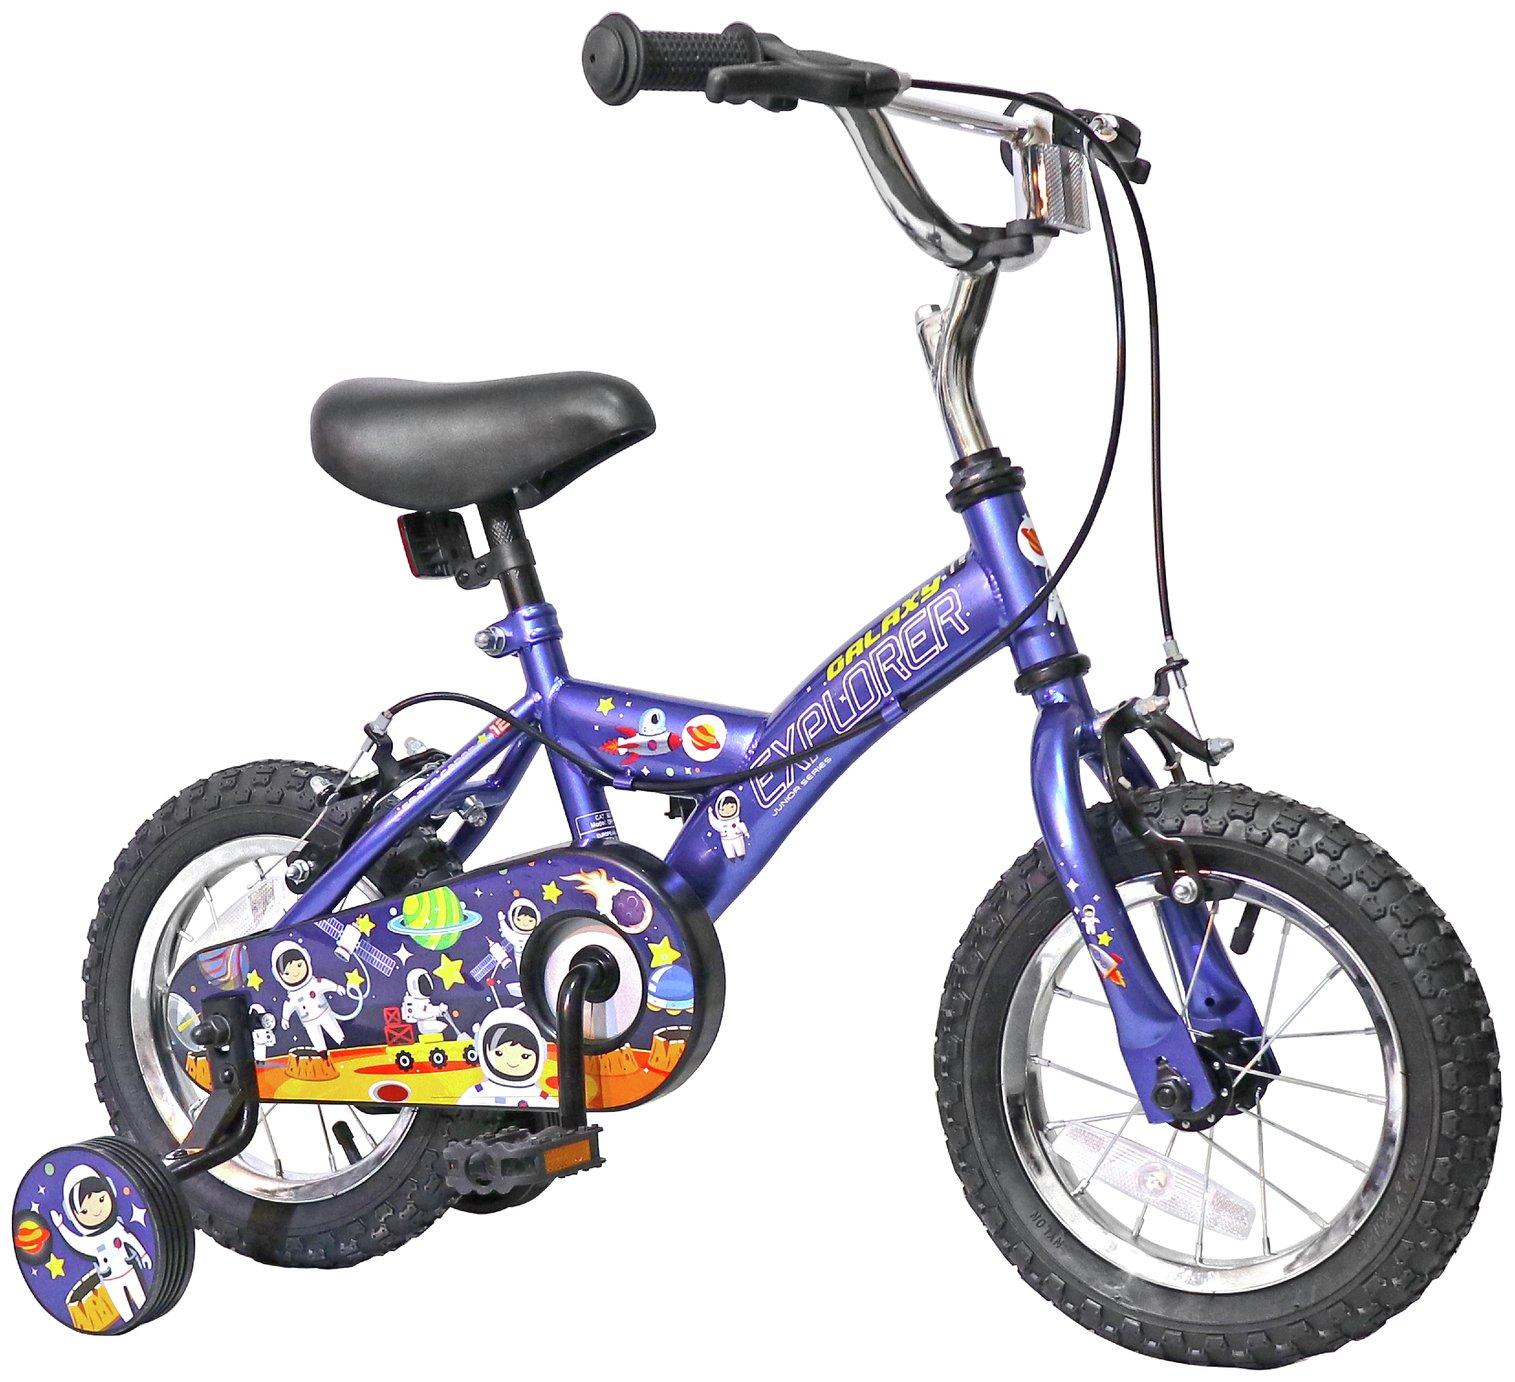 12 Inch Space Explorer Kid's Bike